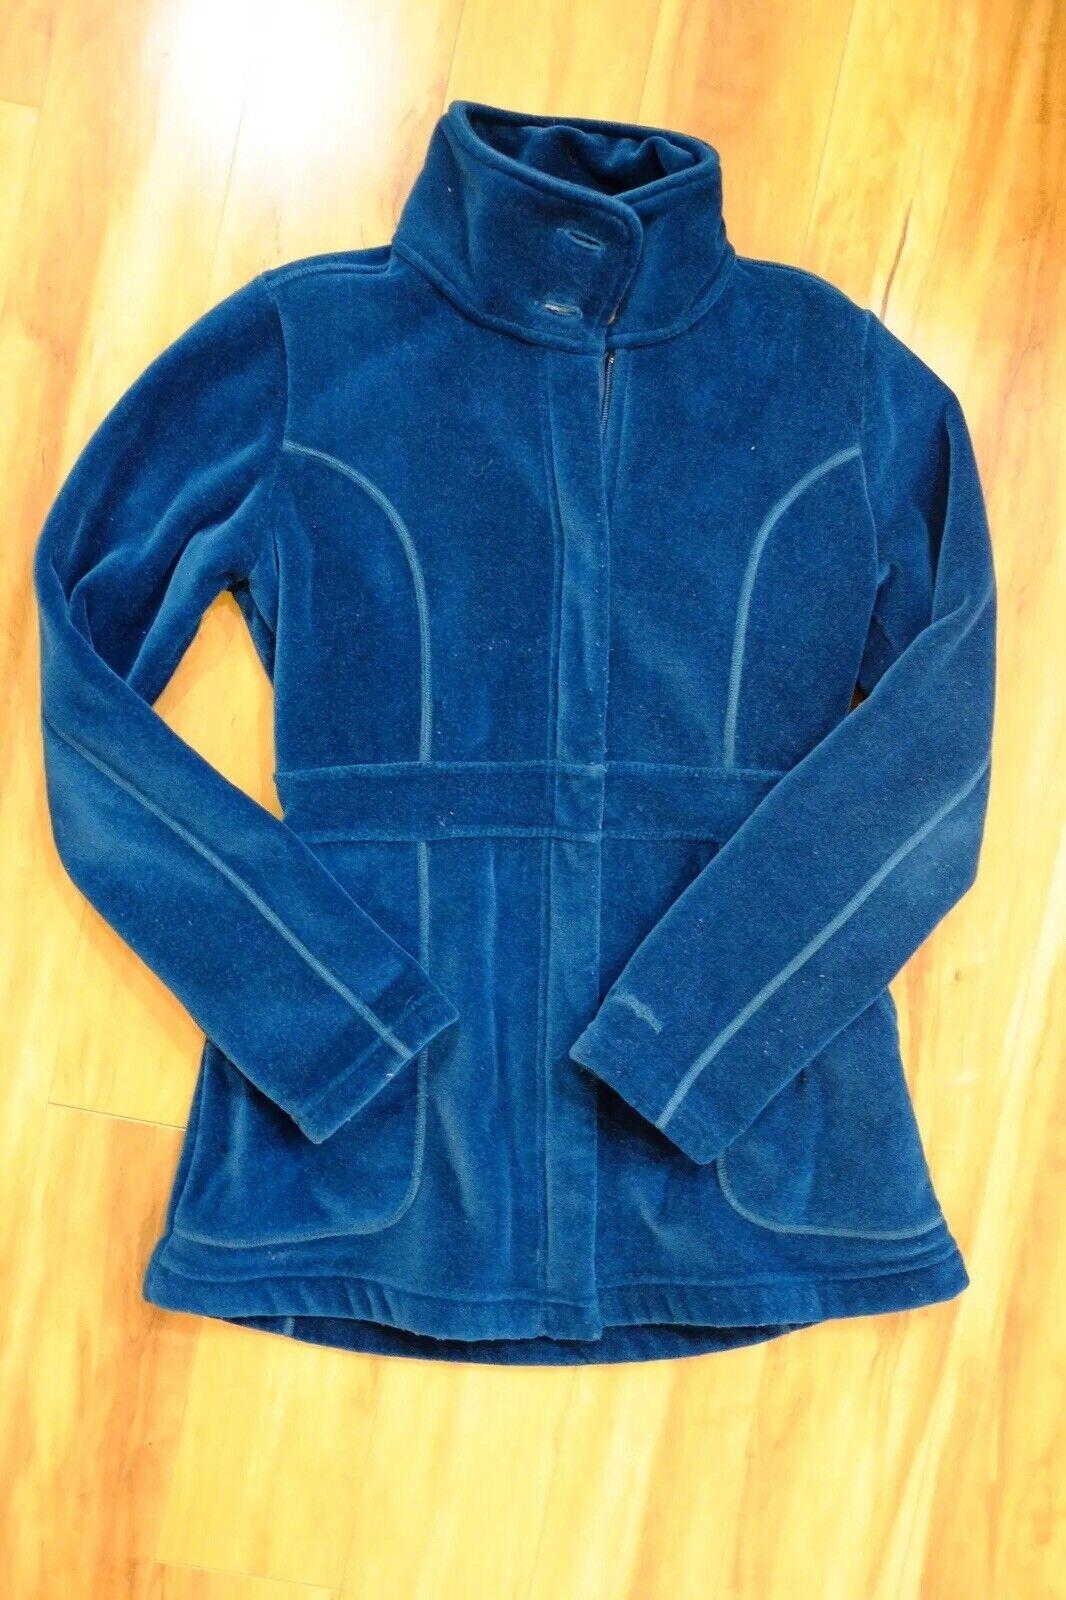 Patagonia Green bluee Velour Fleece Coat Size 2 Womens. Polartec Fleece R2